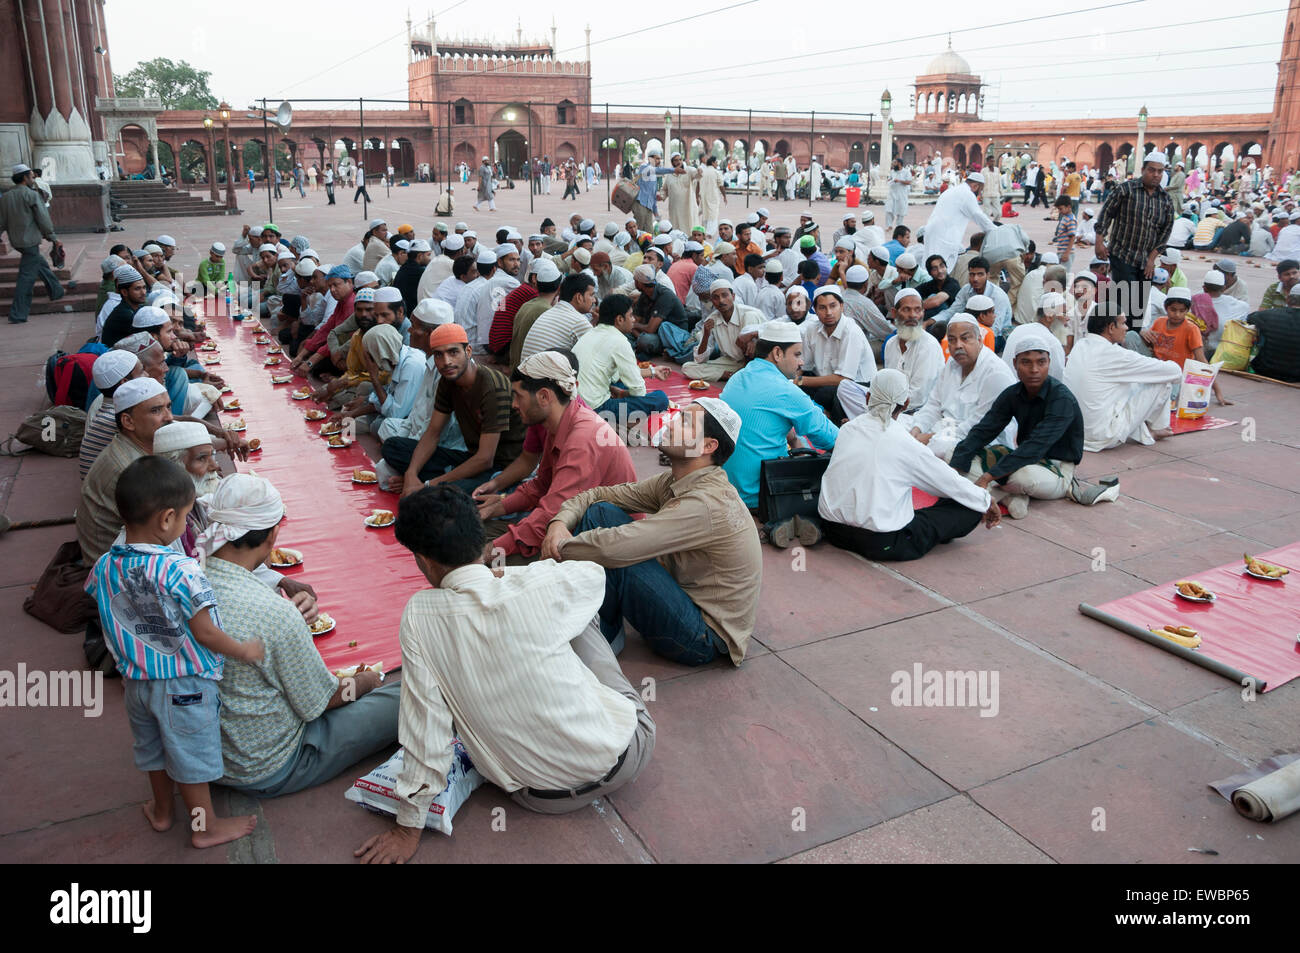 Traditional Iftar (fast-breaking) at Jama Masjid during Ramadan. Old Delhi, India. - Stock Image